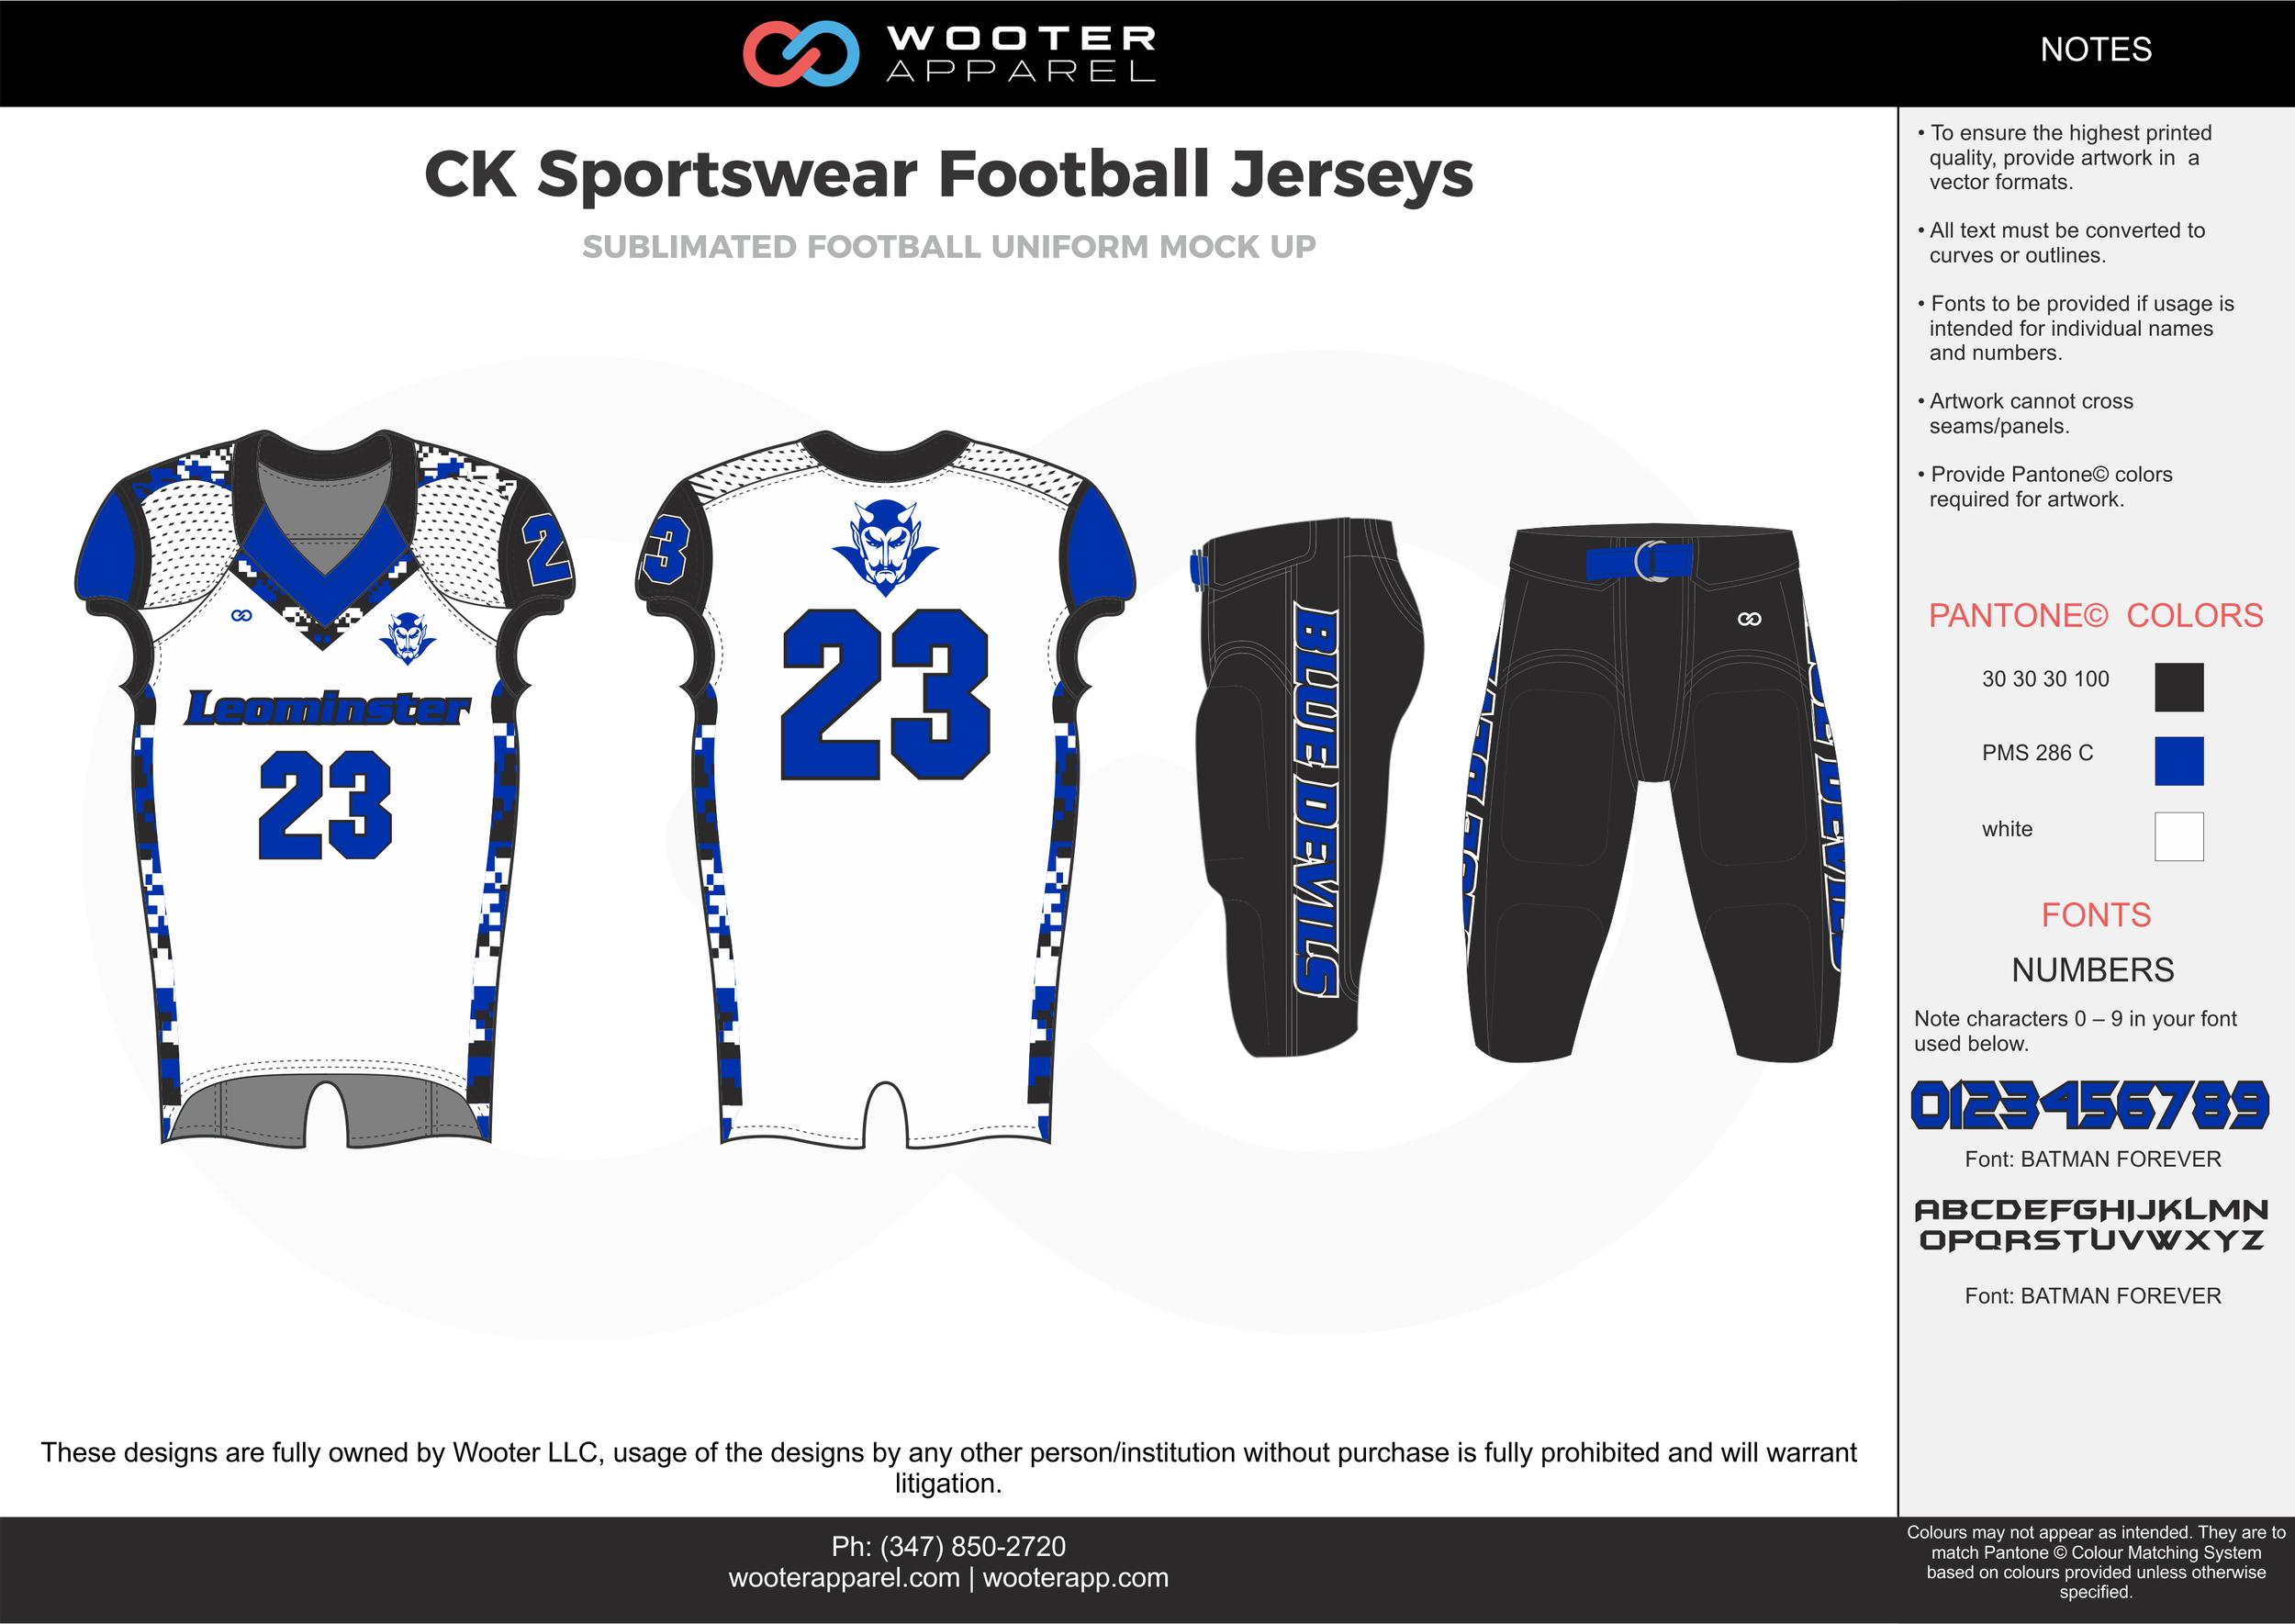 CK Sportswear black white blue football uniforms jerseys pants